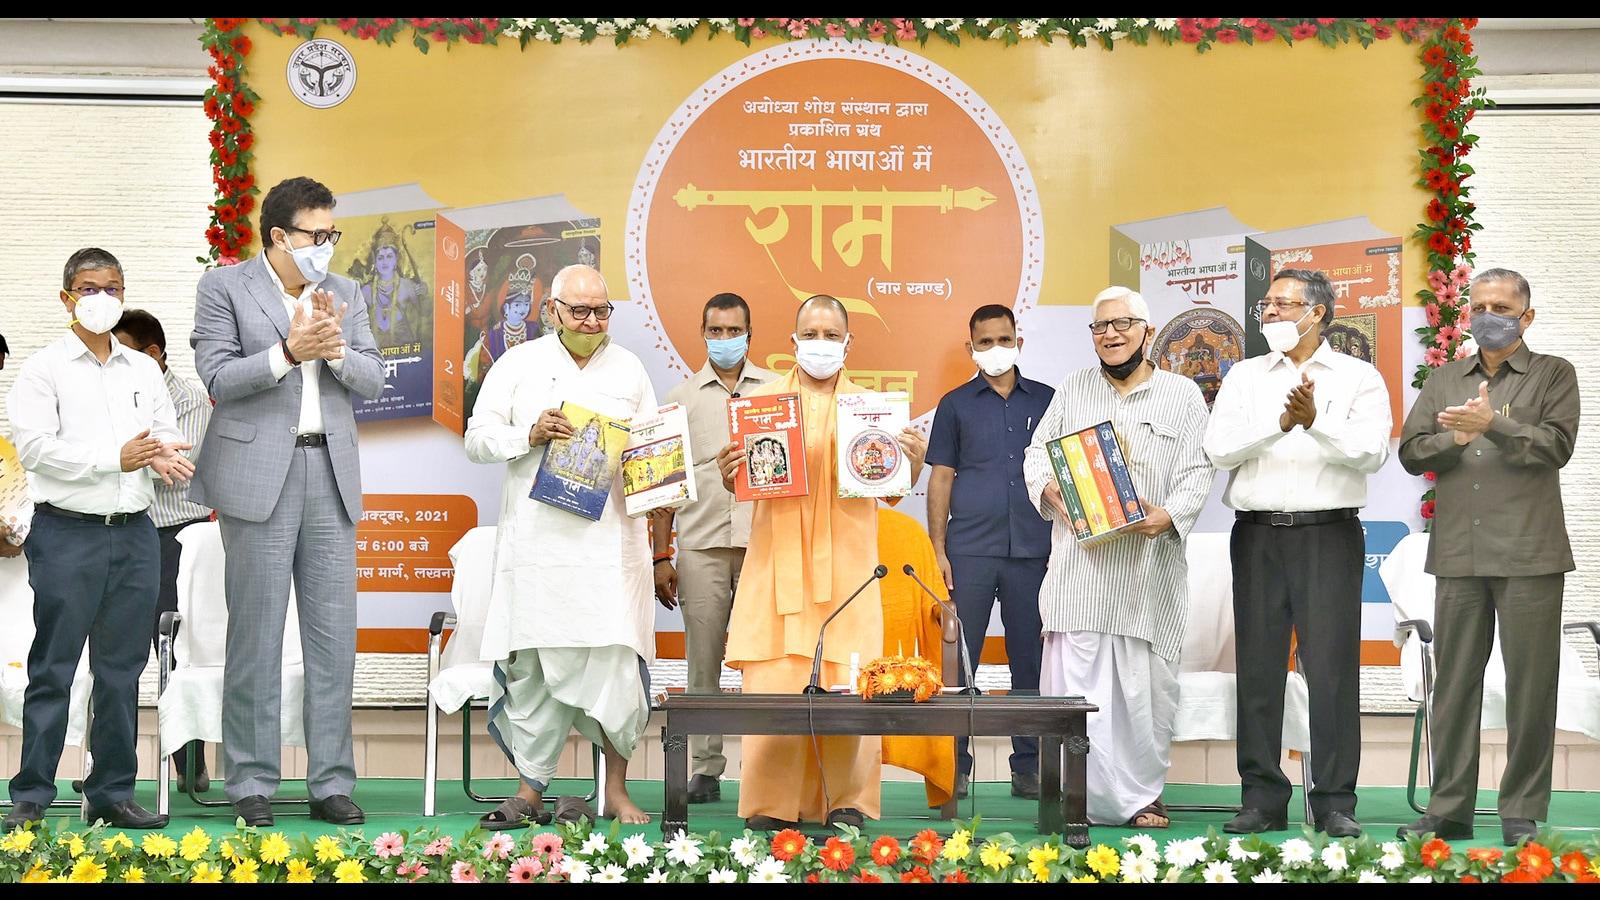 Lord Ram is symbol of Indianness: Yogi Adityanath